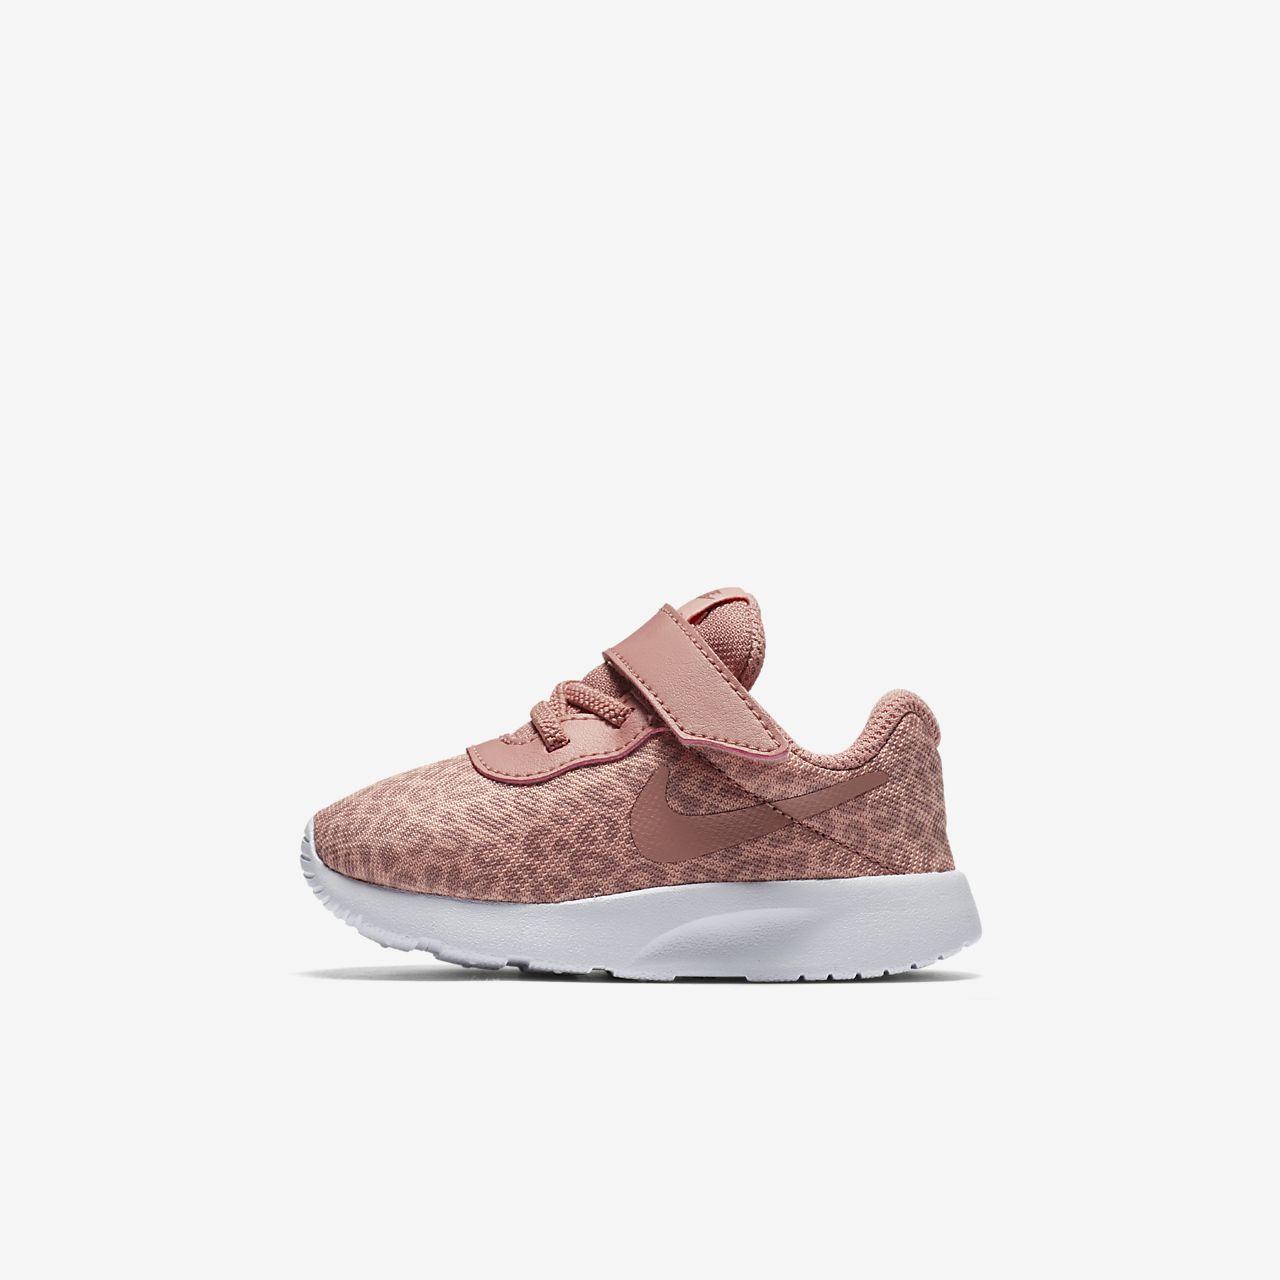 22a9fe31fcd ... tenis nike tanjun gris y blanco f271a 22c10 sale calzado para bebés nike  tanjun print c44a9 f115c ...